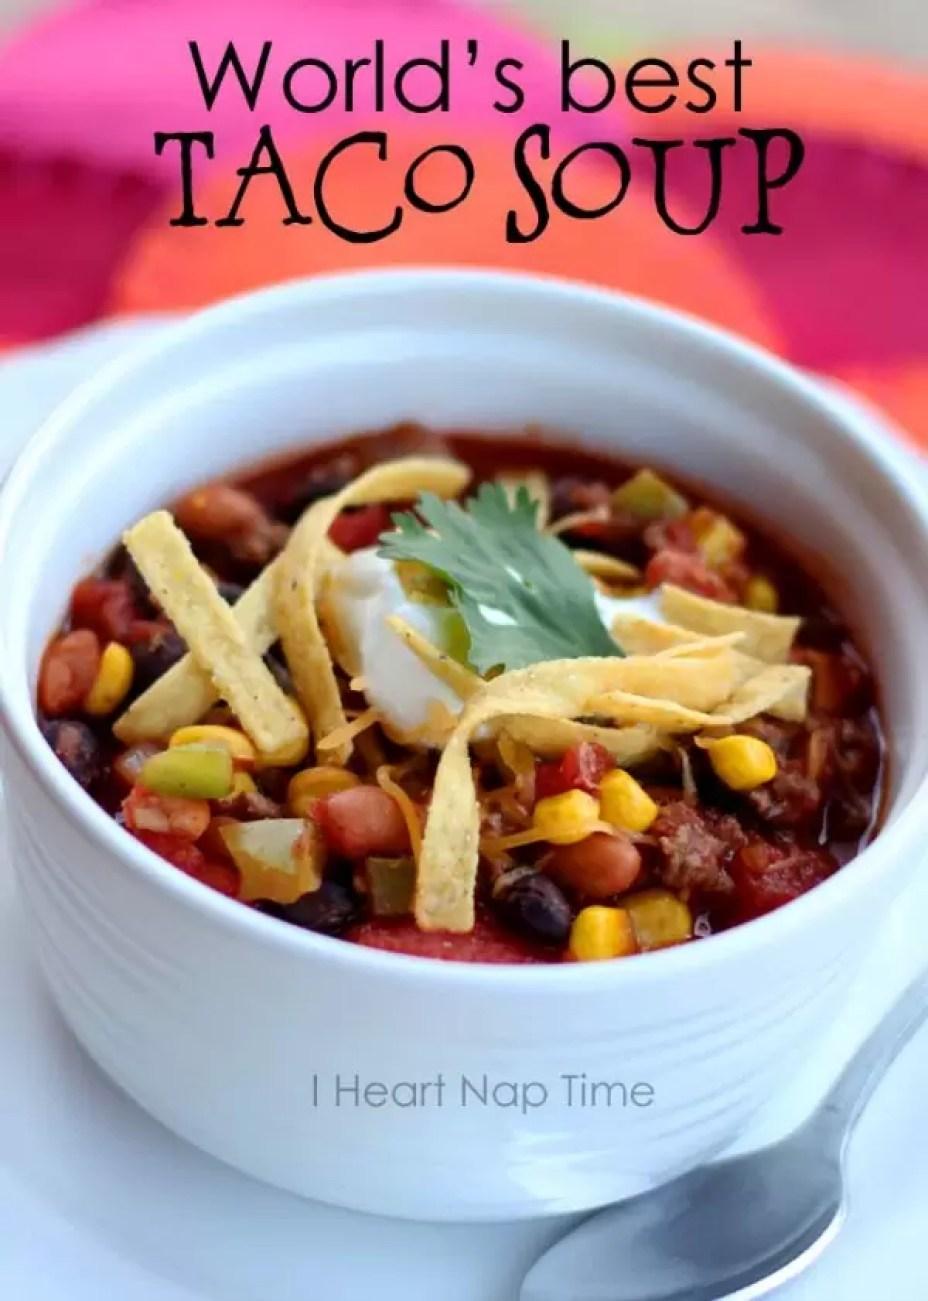 Taco Soup by I Heart Nap Time